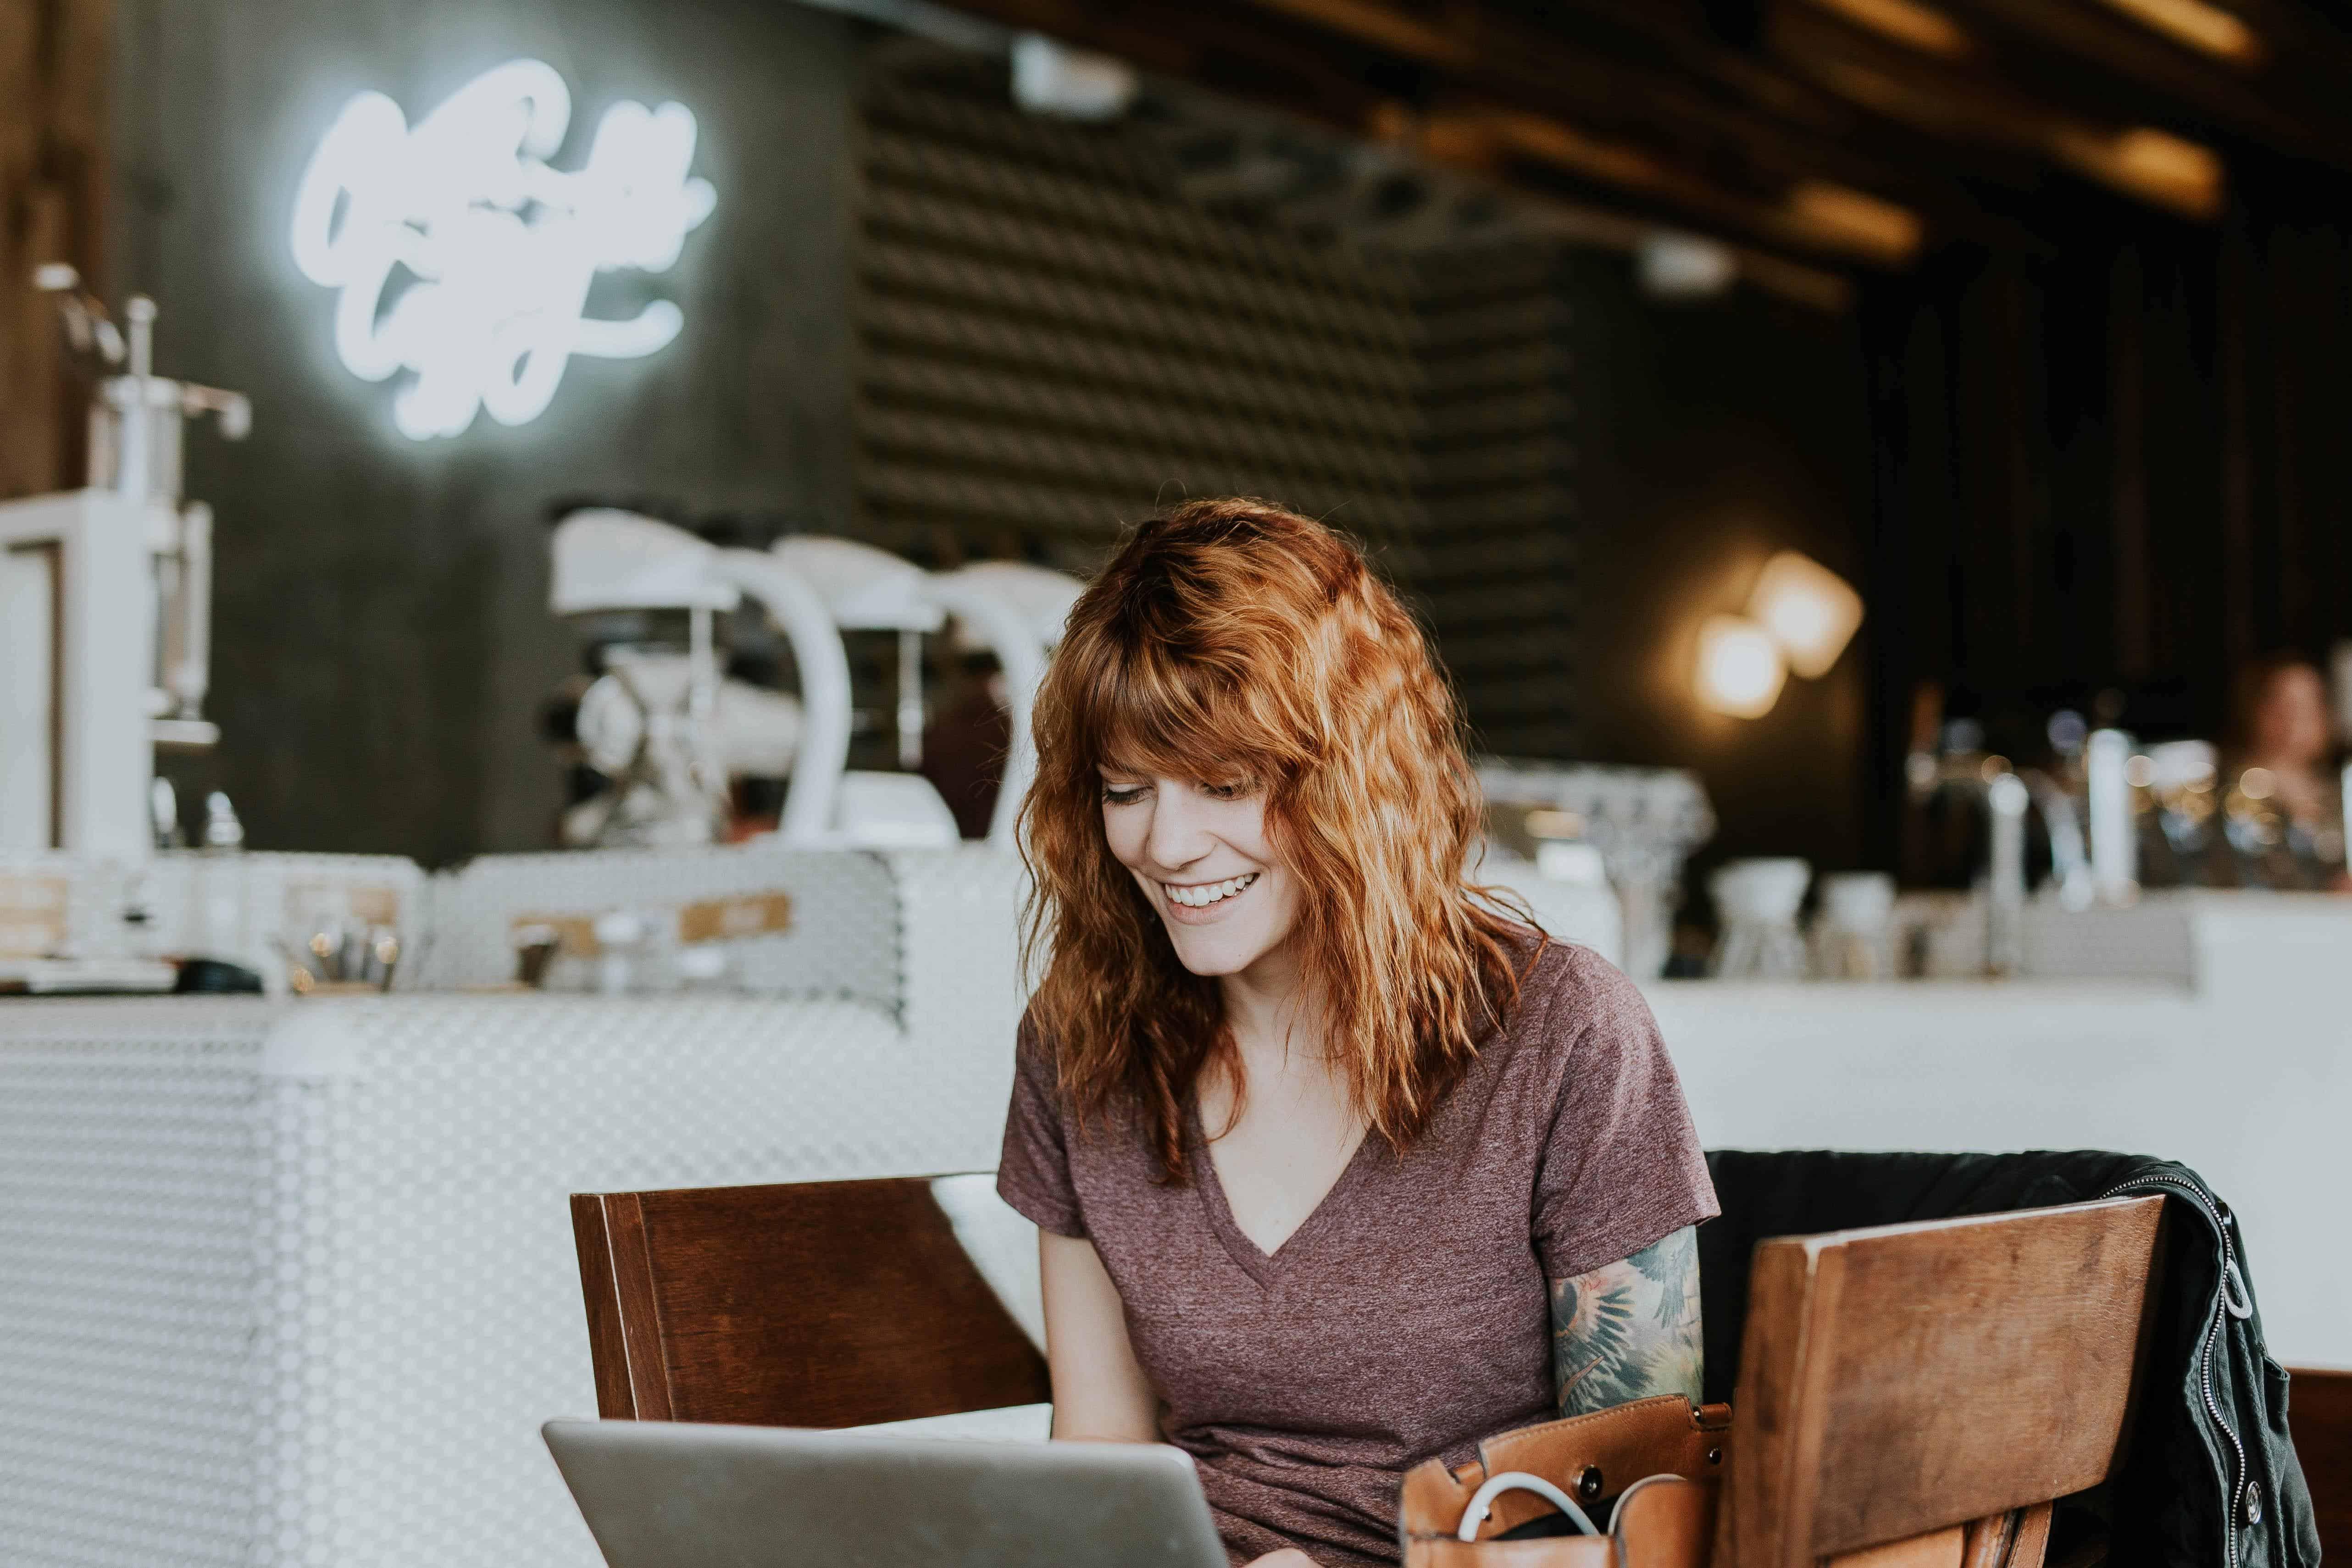 girl, computer, work